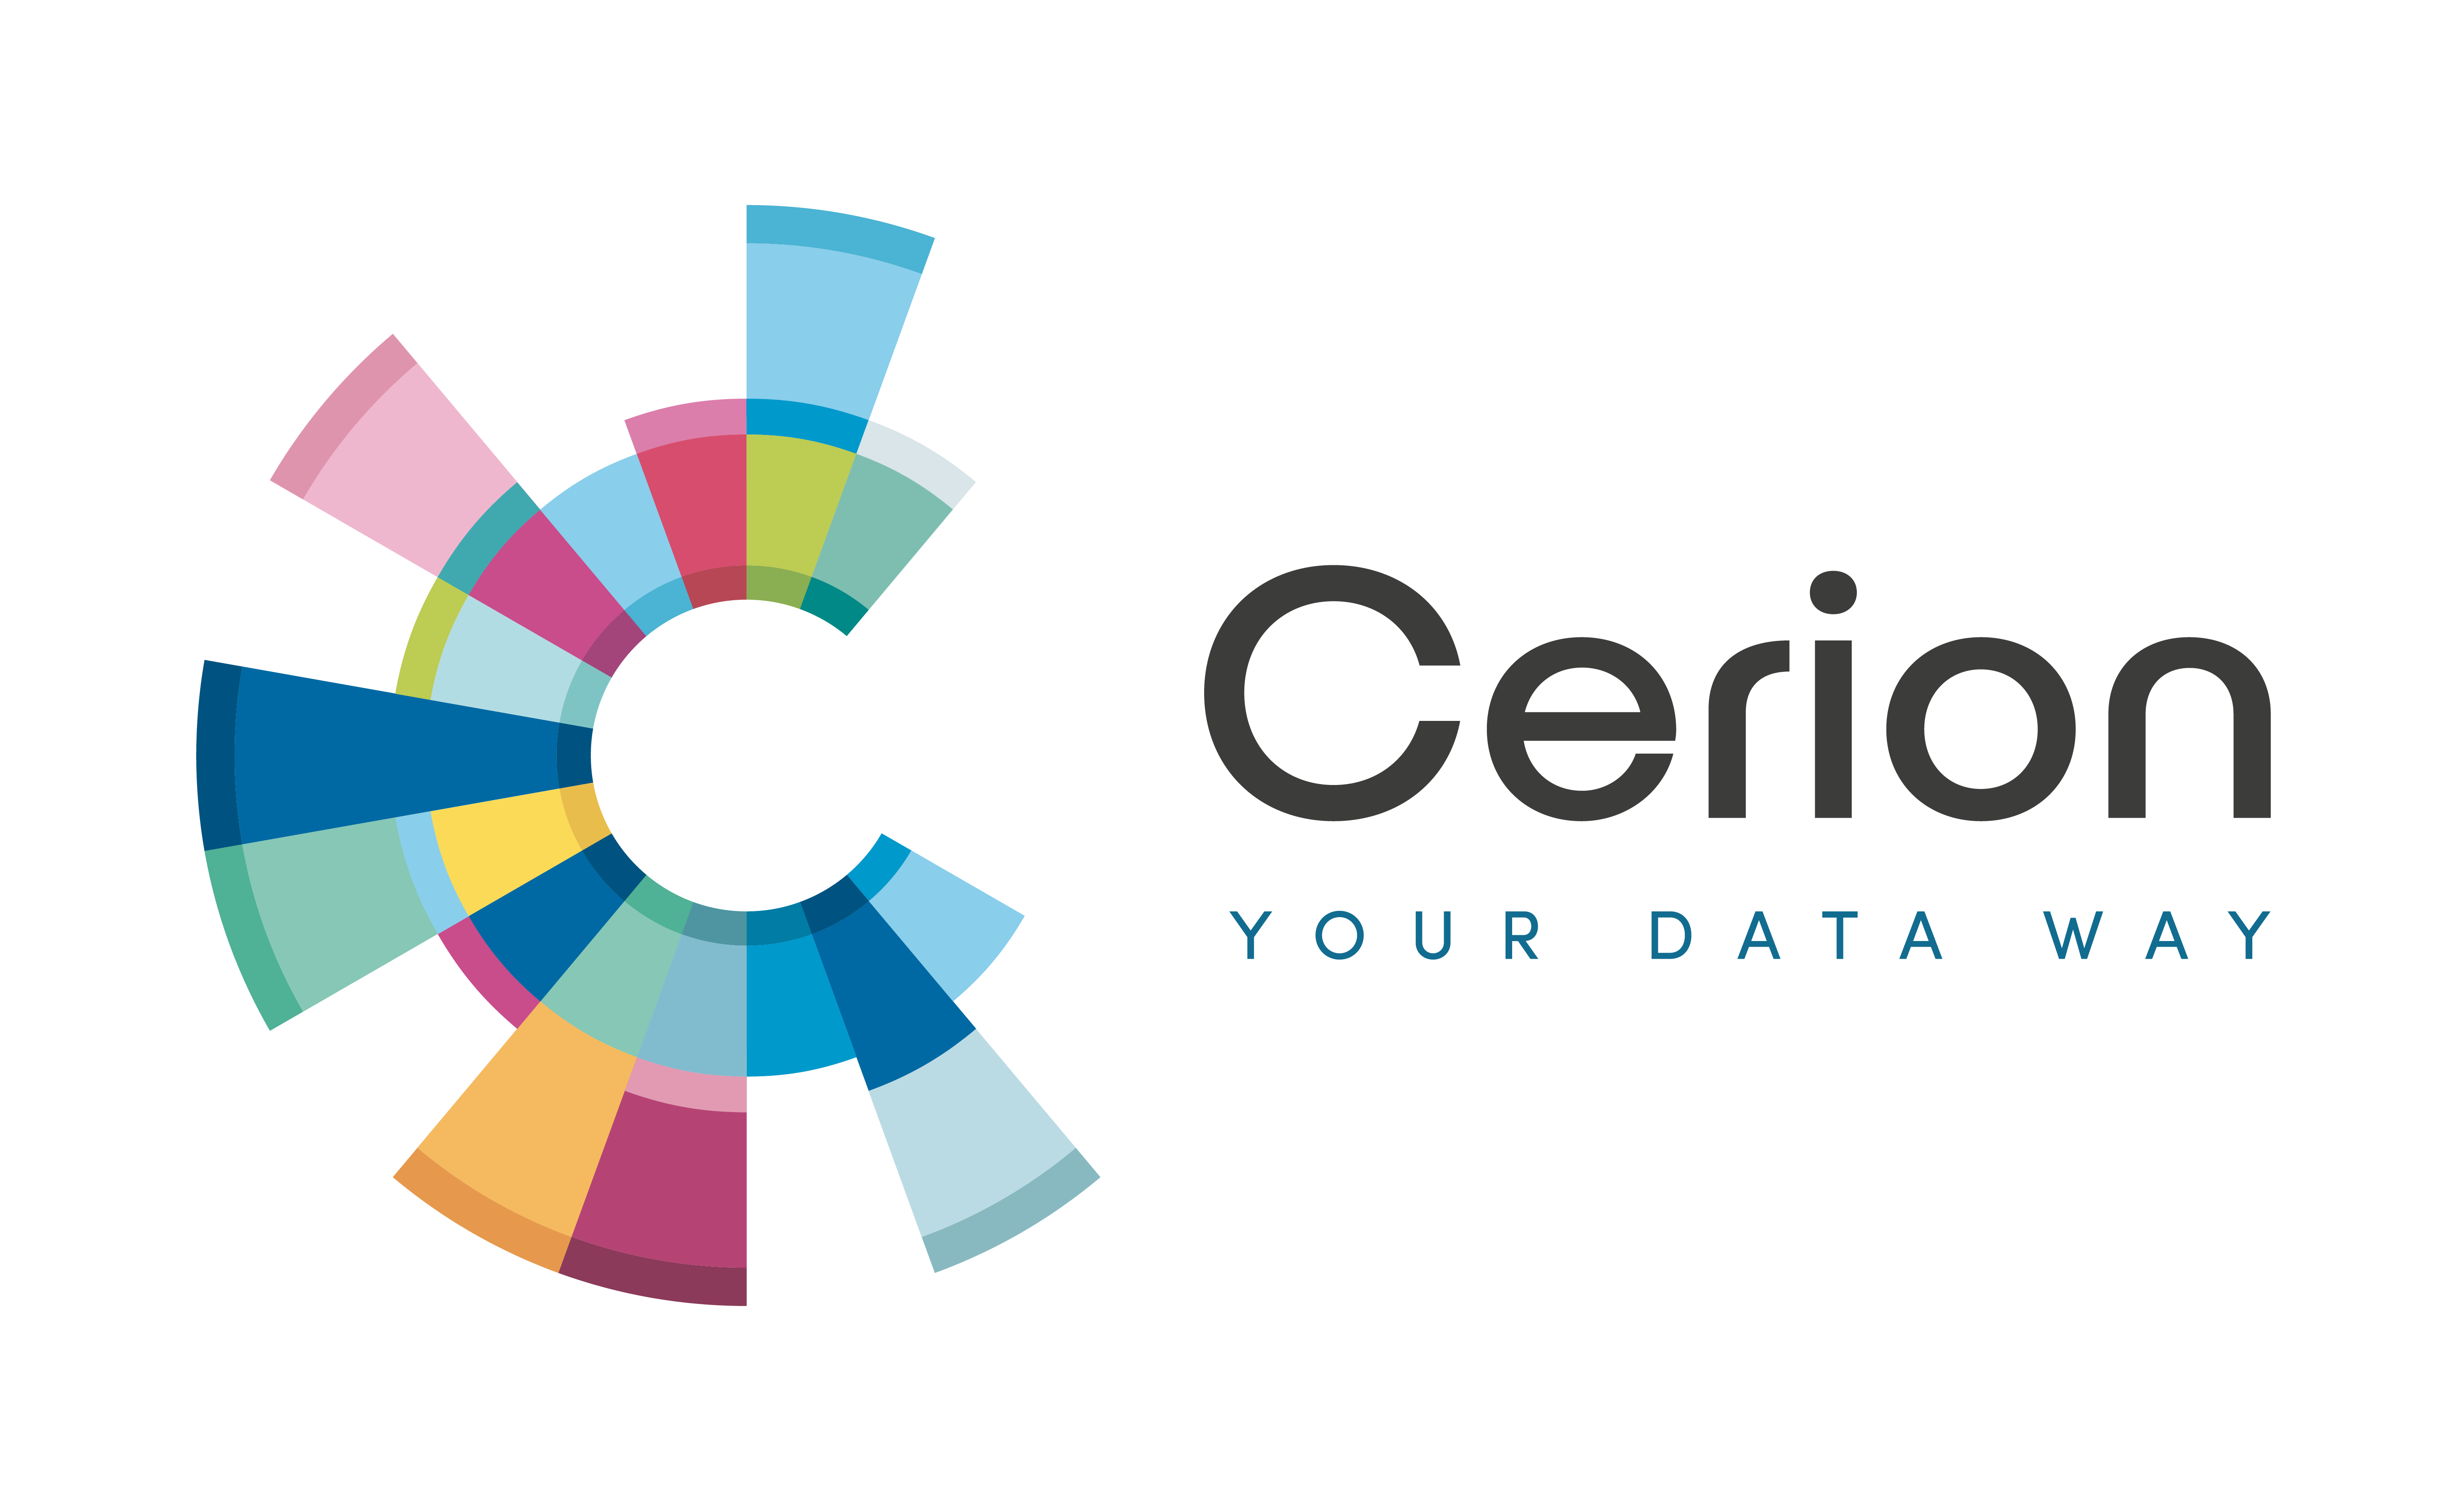 cerion-sap-ratkaisukonsultteja-turku-sdsuu-3302383 logo